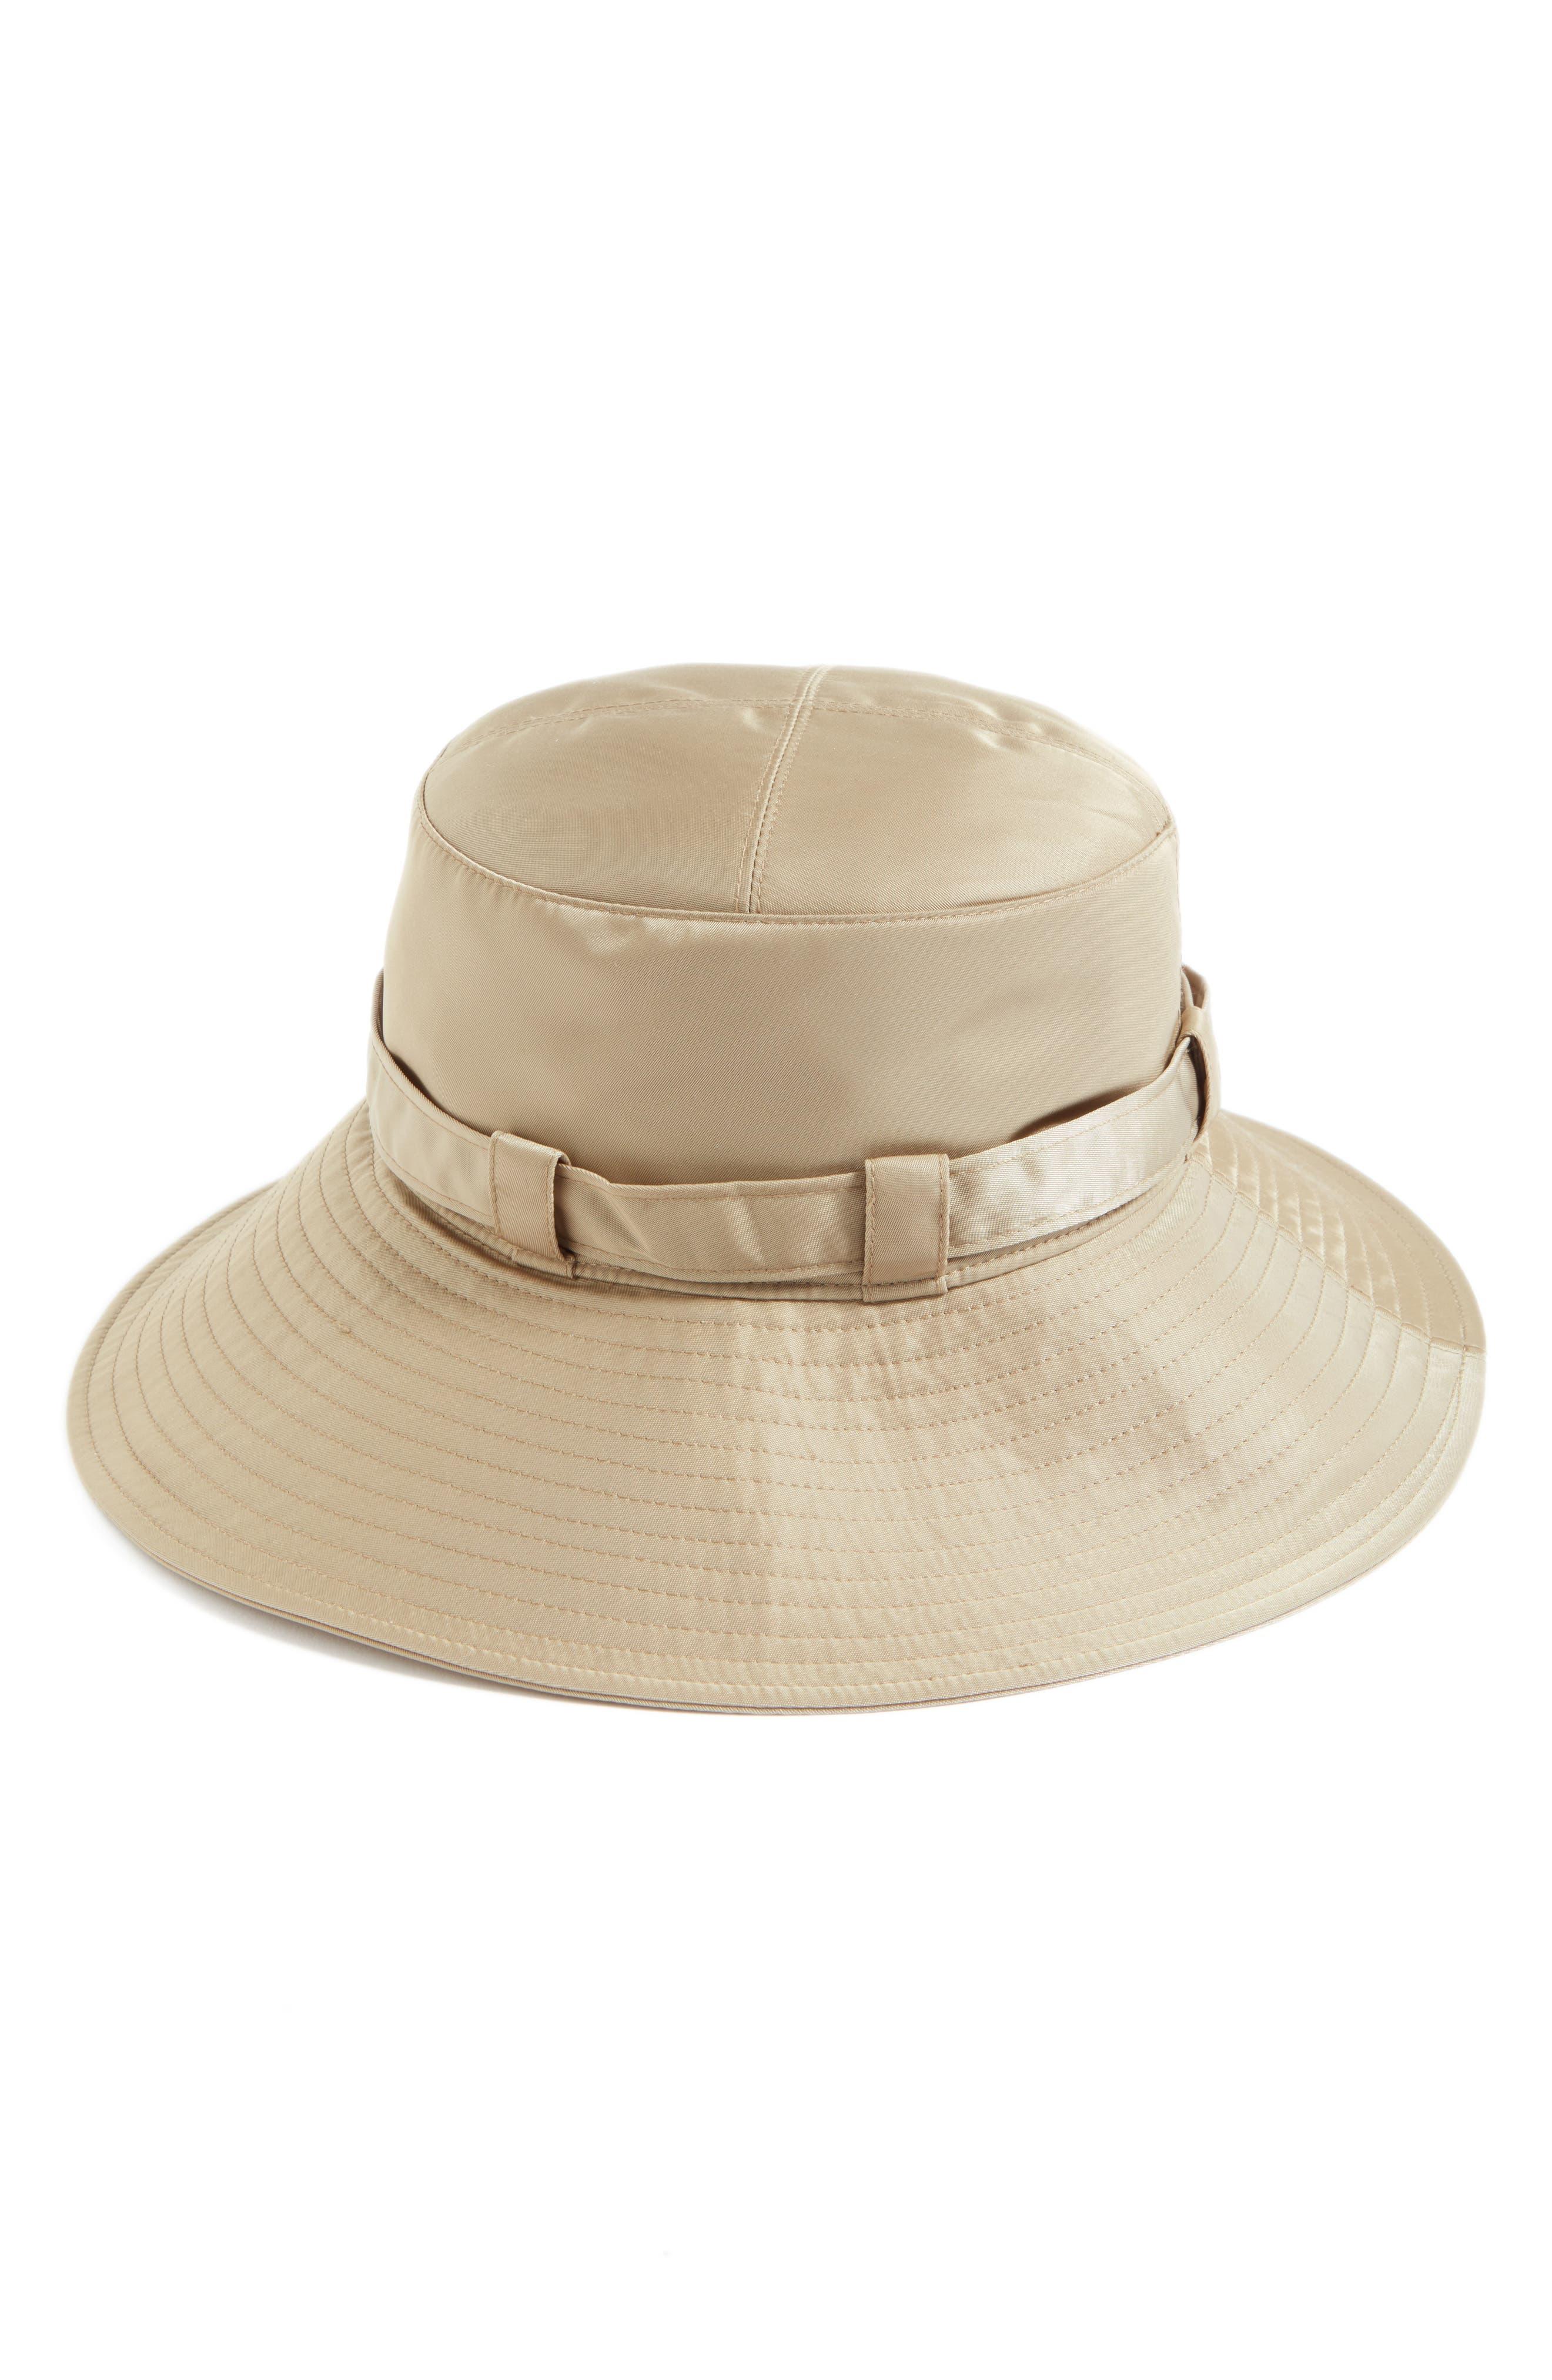 Alternate Image 1 Selected - Eric Javits 'Kaya' Hat